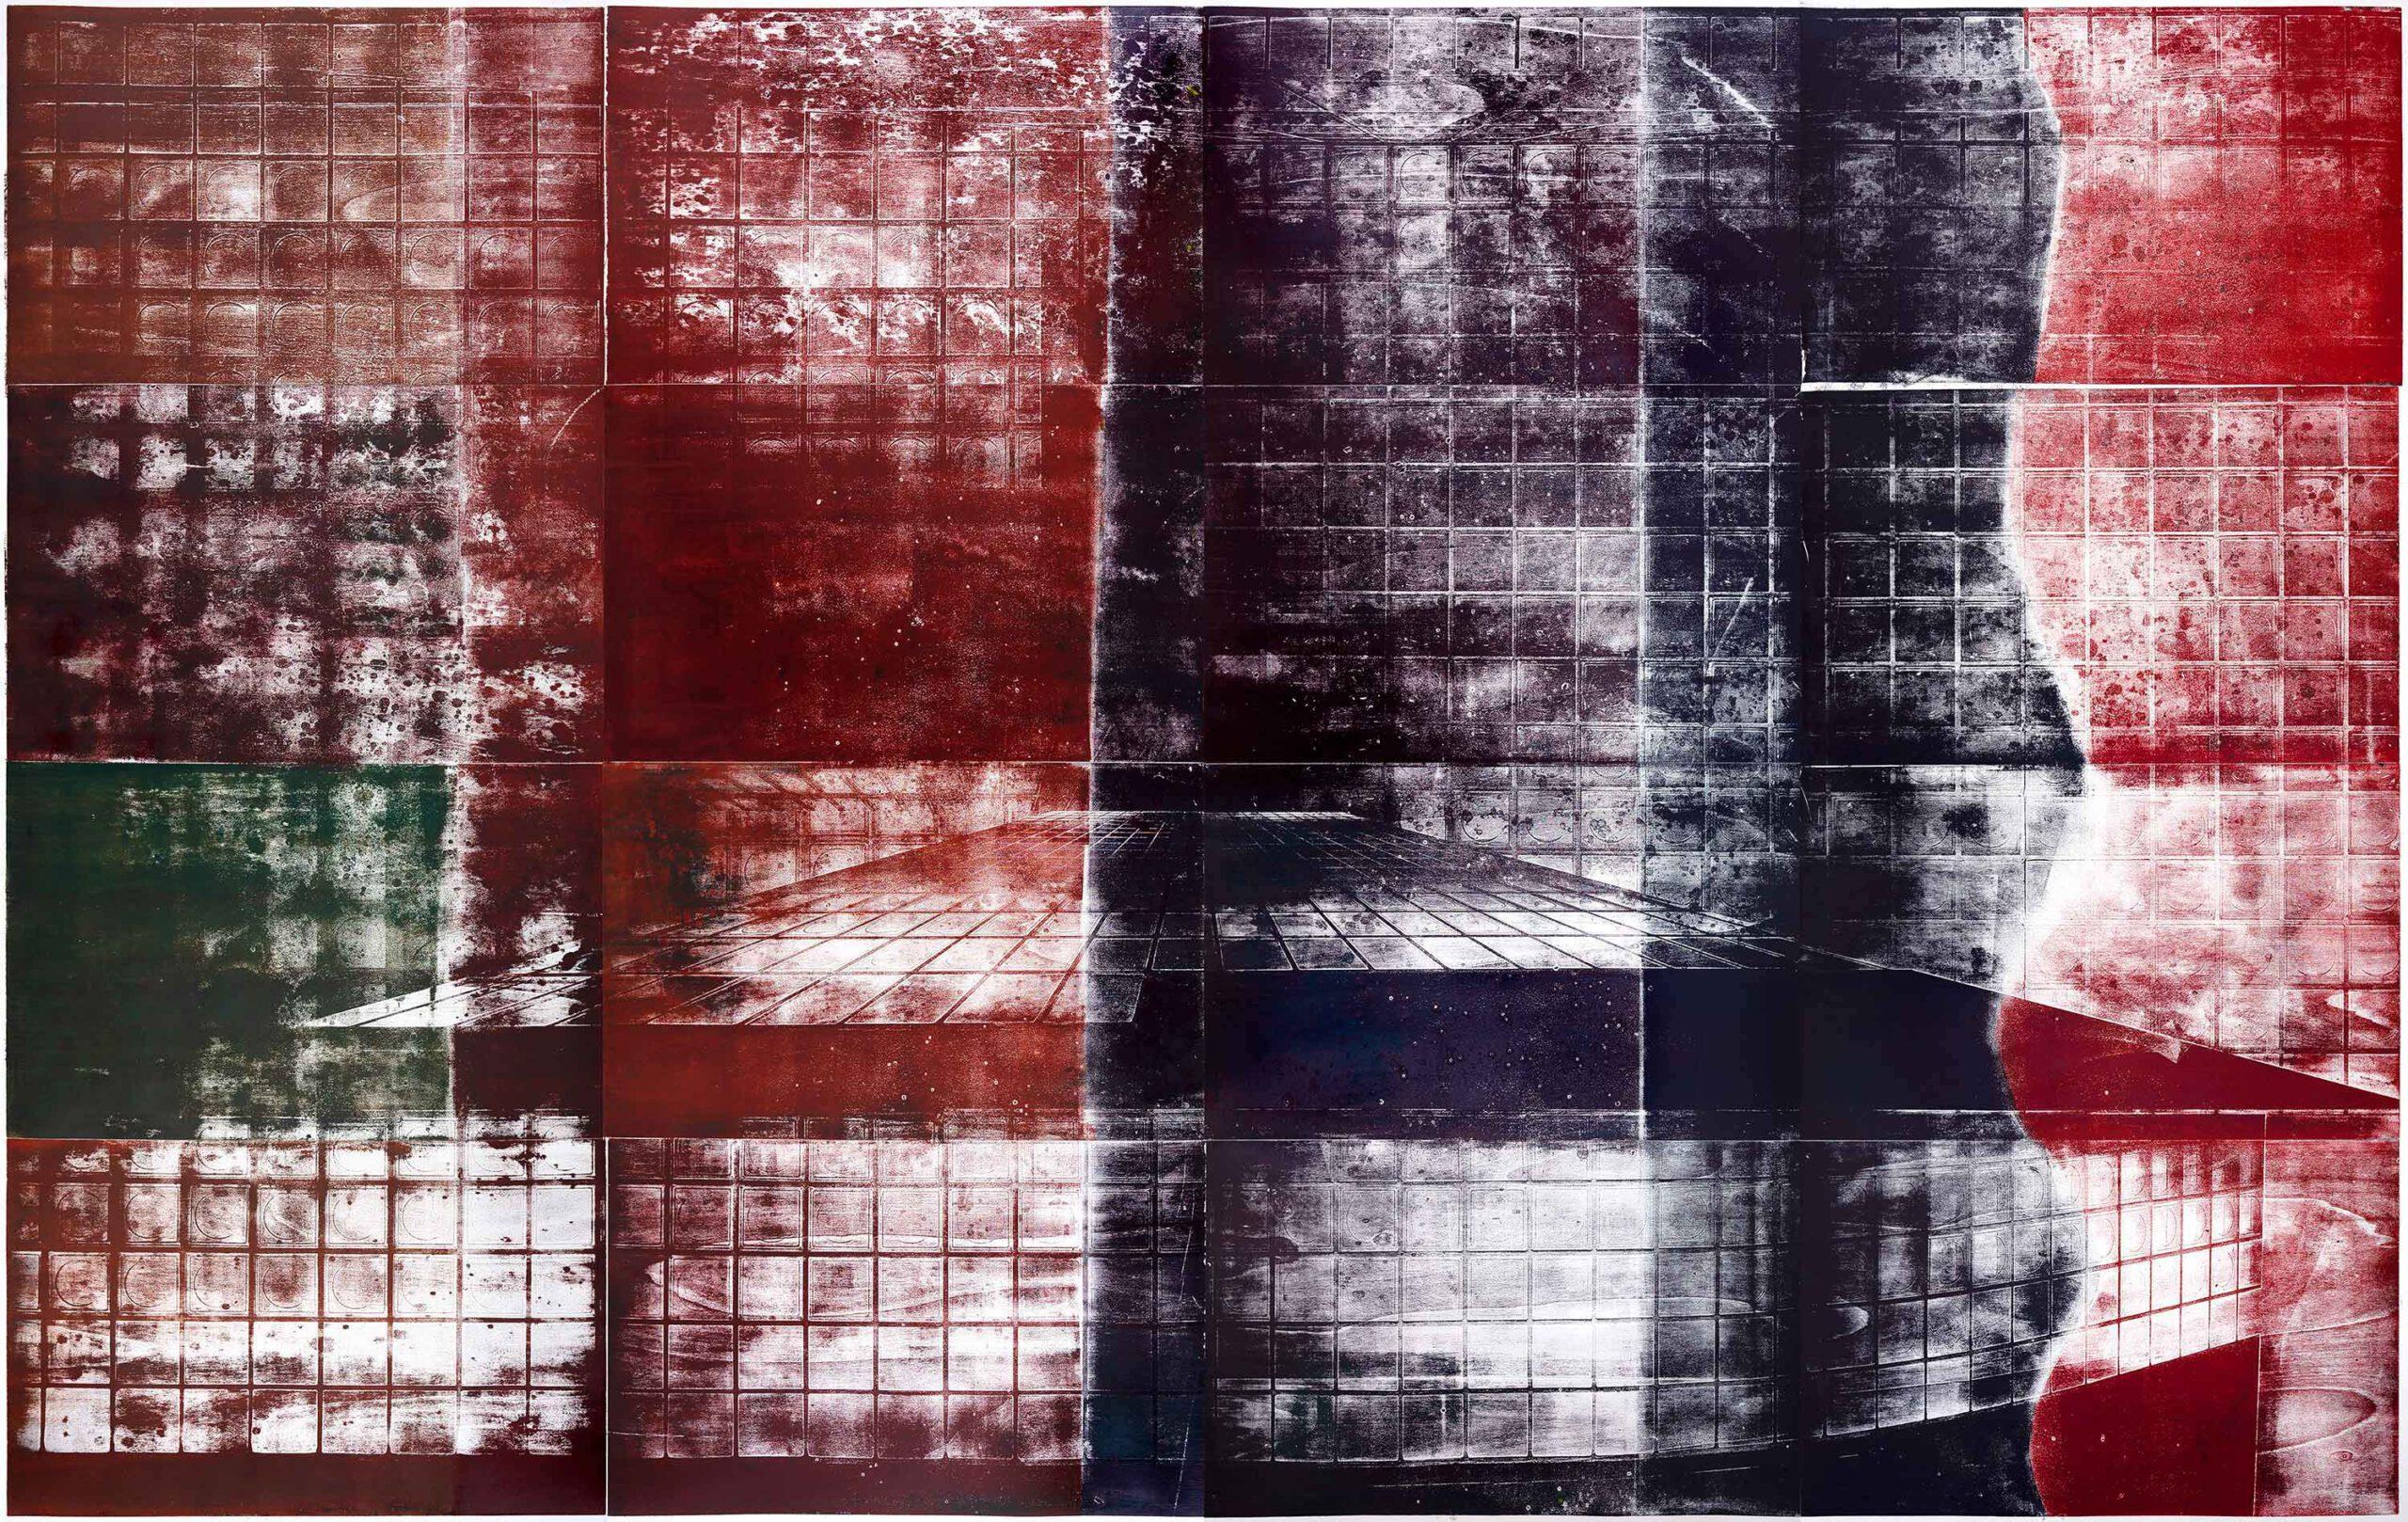 Farben (der Gewalt), 2020, wood engraving, 252,5 x 391,4 cm